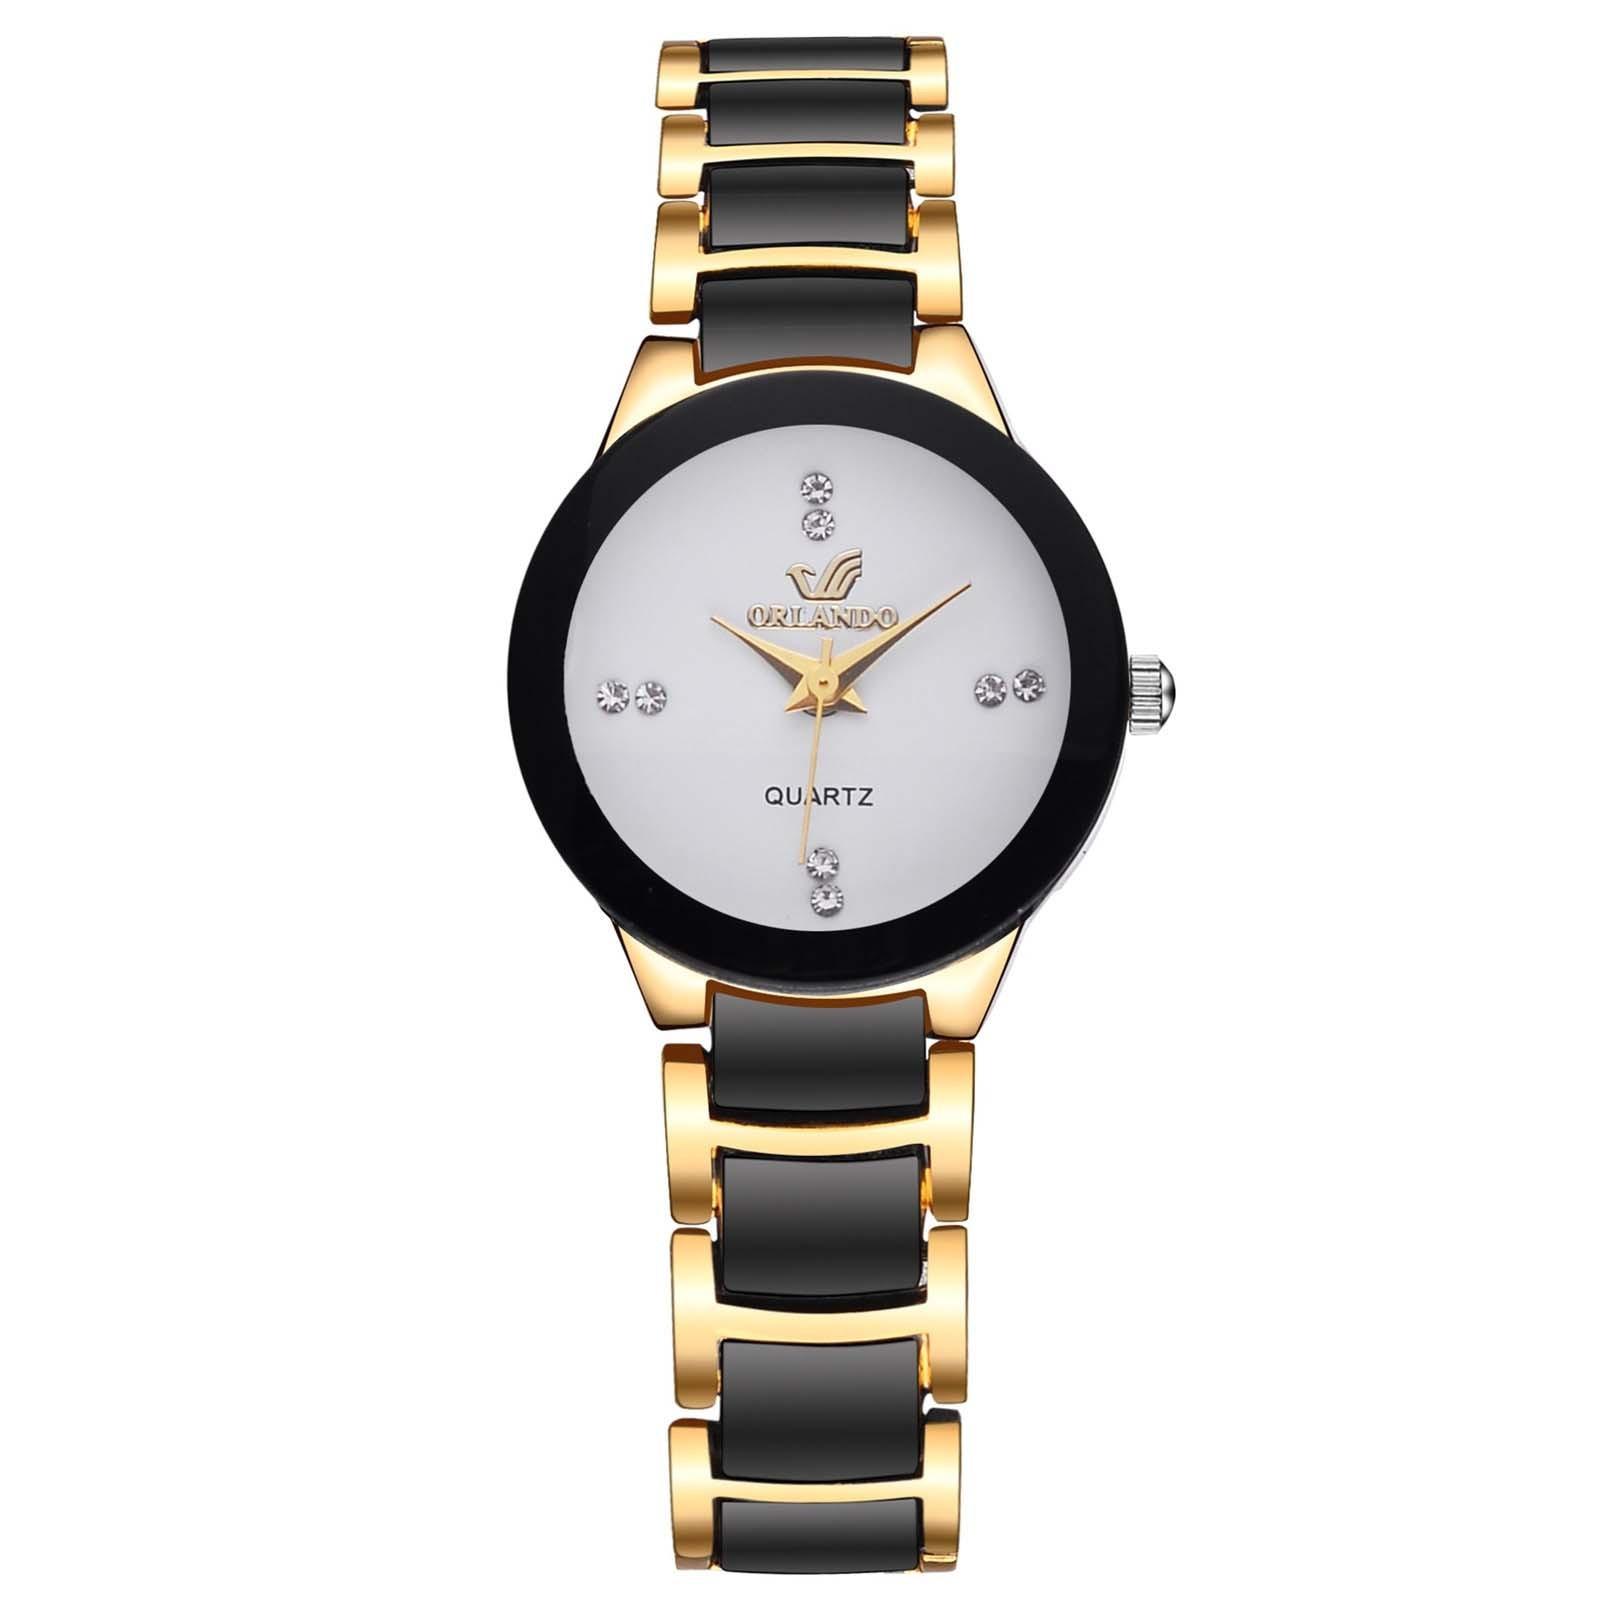 Luxury Fashion Women Watch Stainless Steel Strap Quartz Clock Diamond Dial Ladies Watch Jewelry женские часы недорого F5